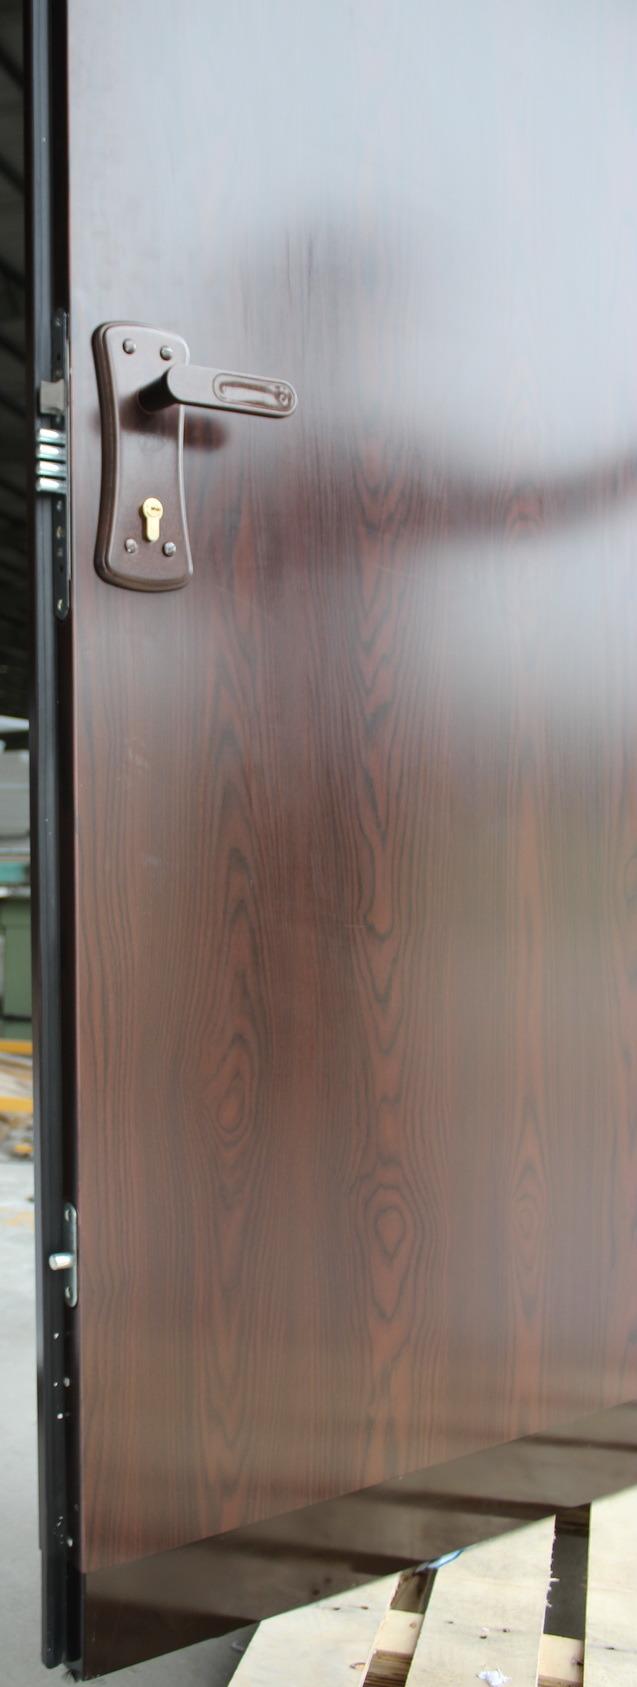 High Quality Residential Bullet Proof Steel Security Door